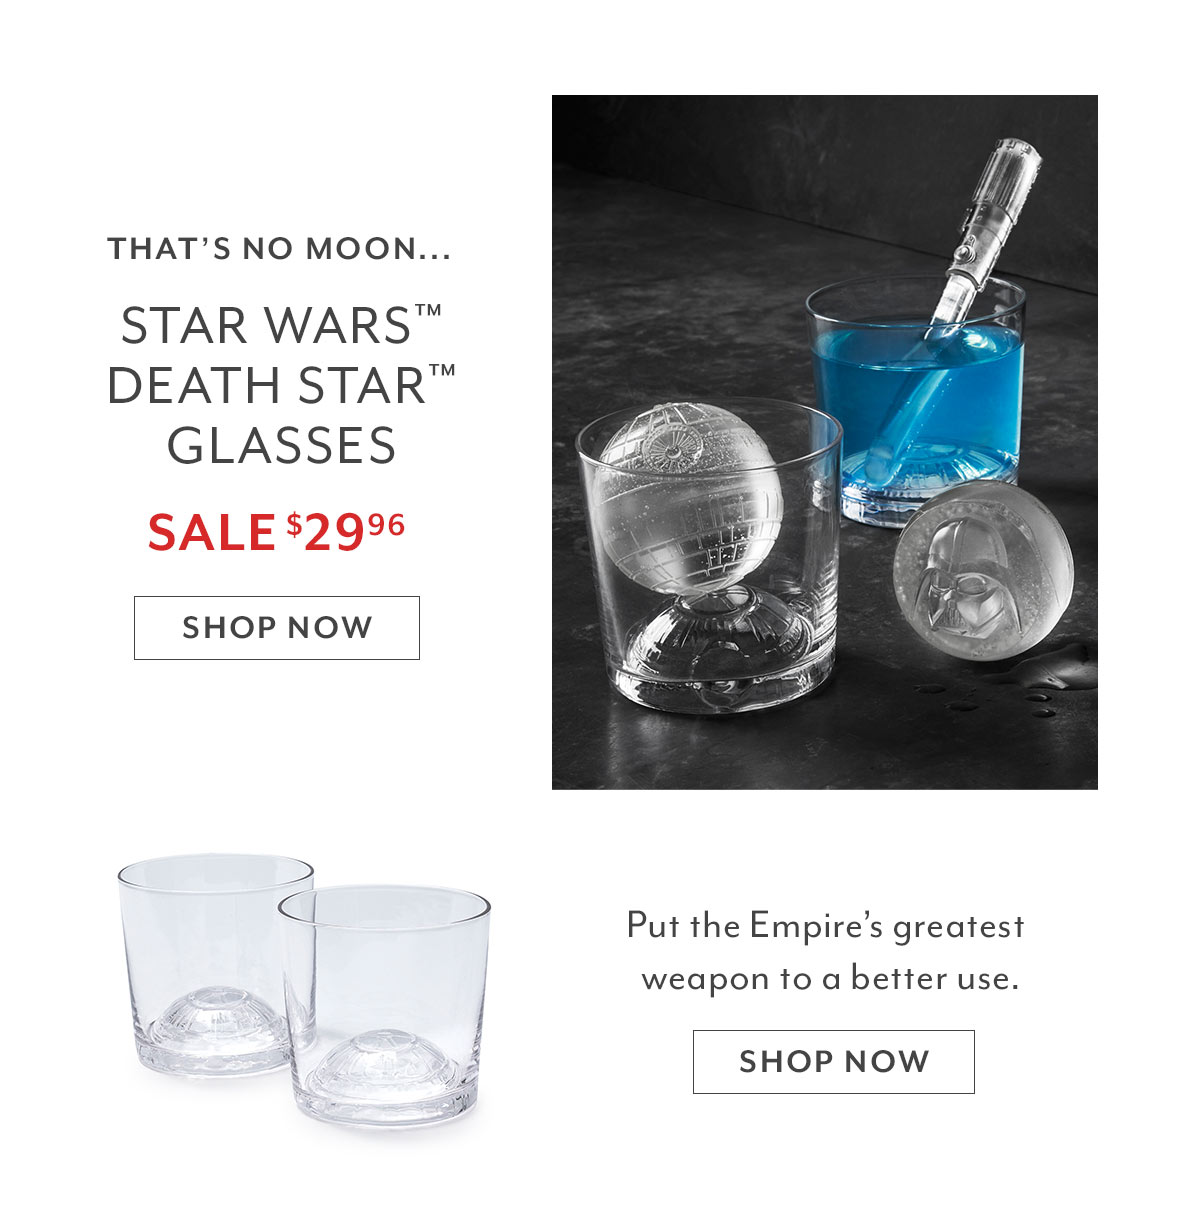 Star Wars™ Death Star™ Glasses